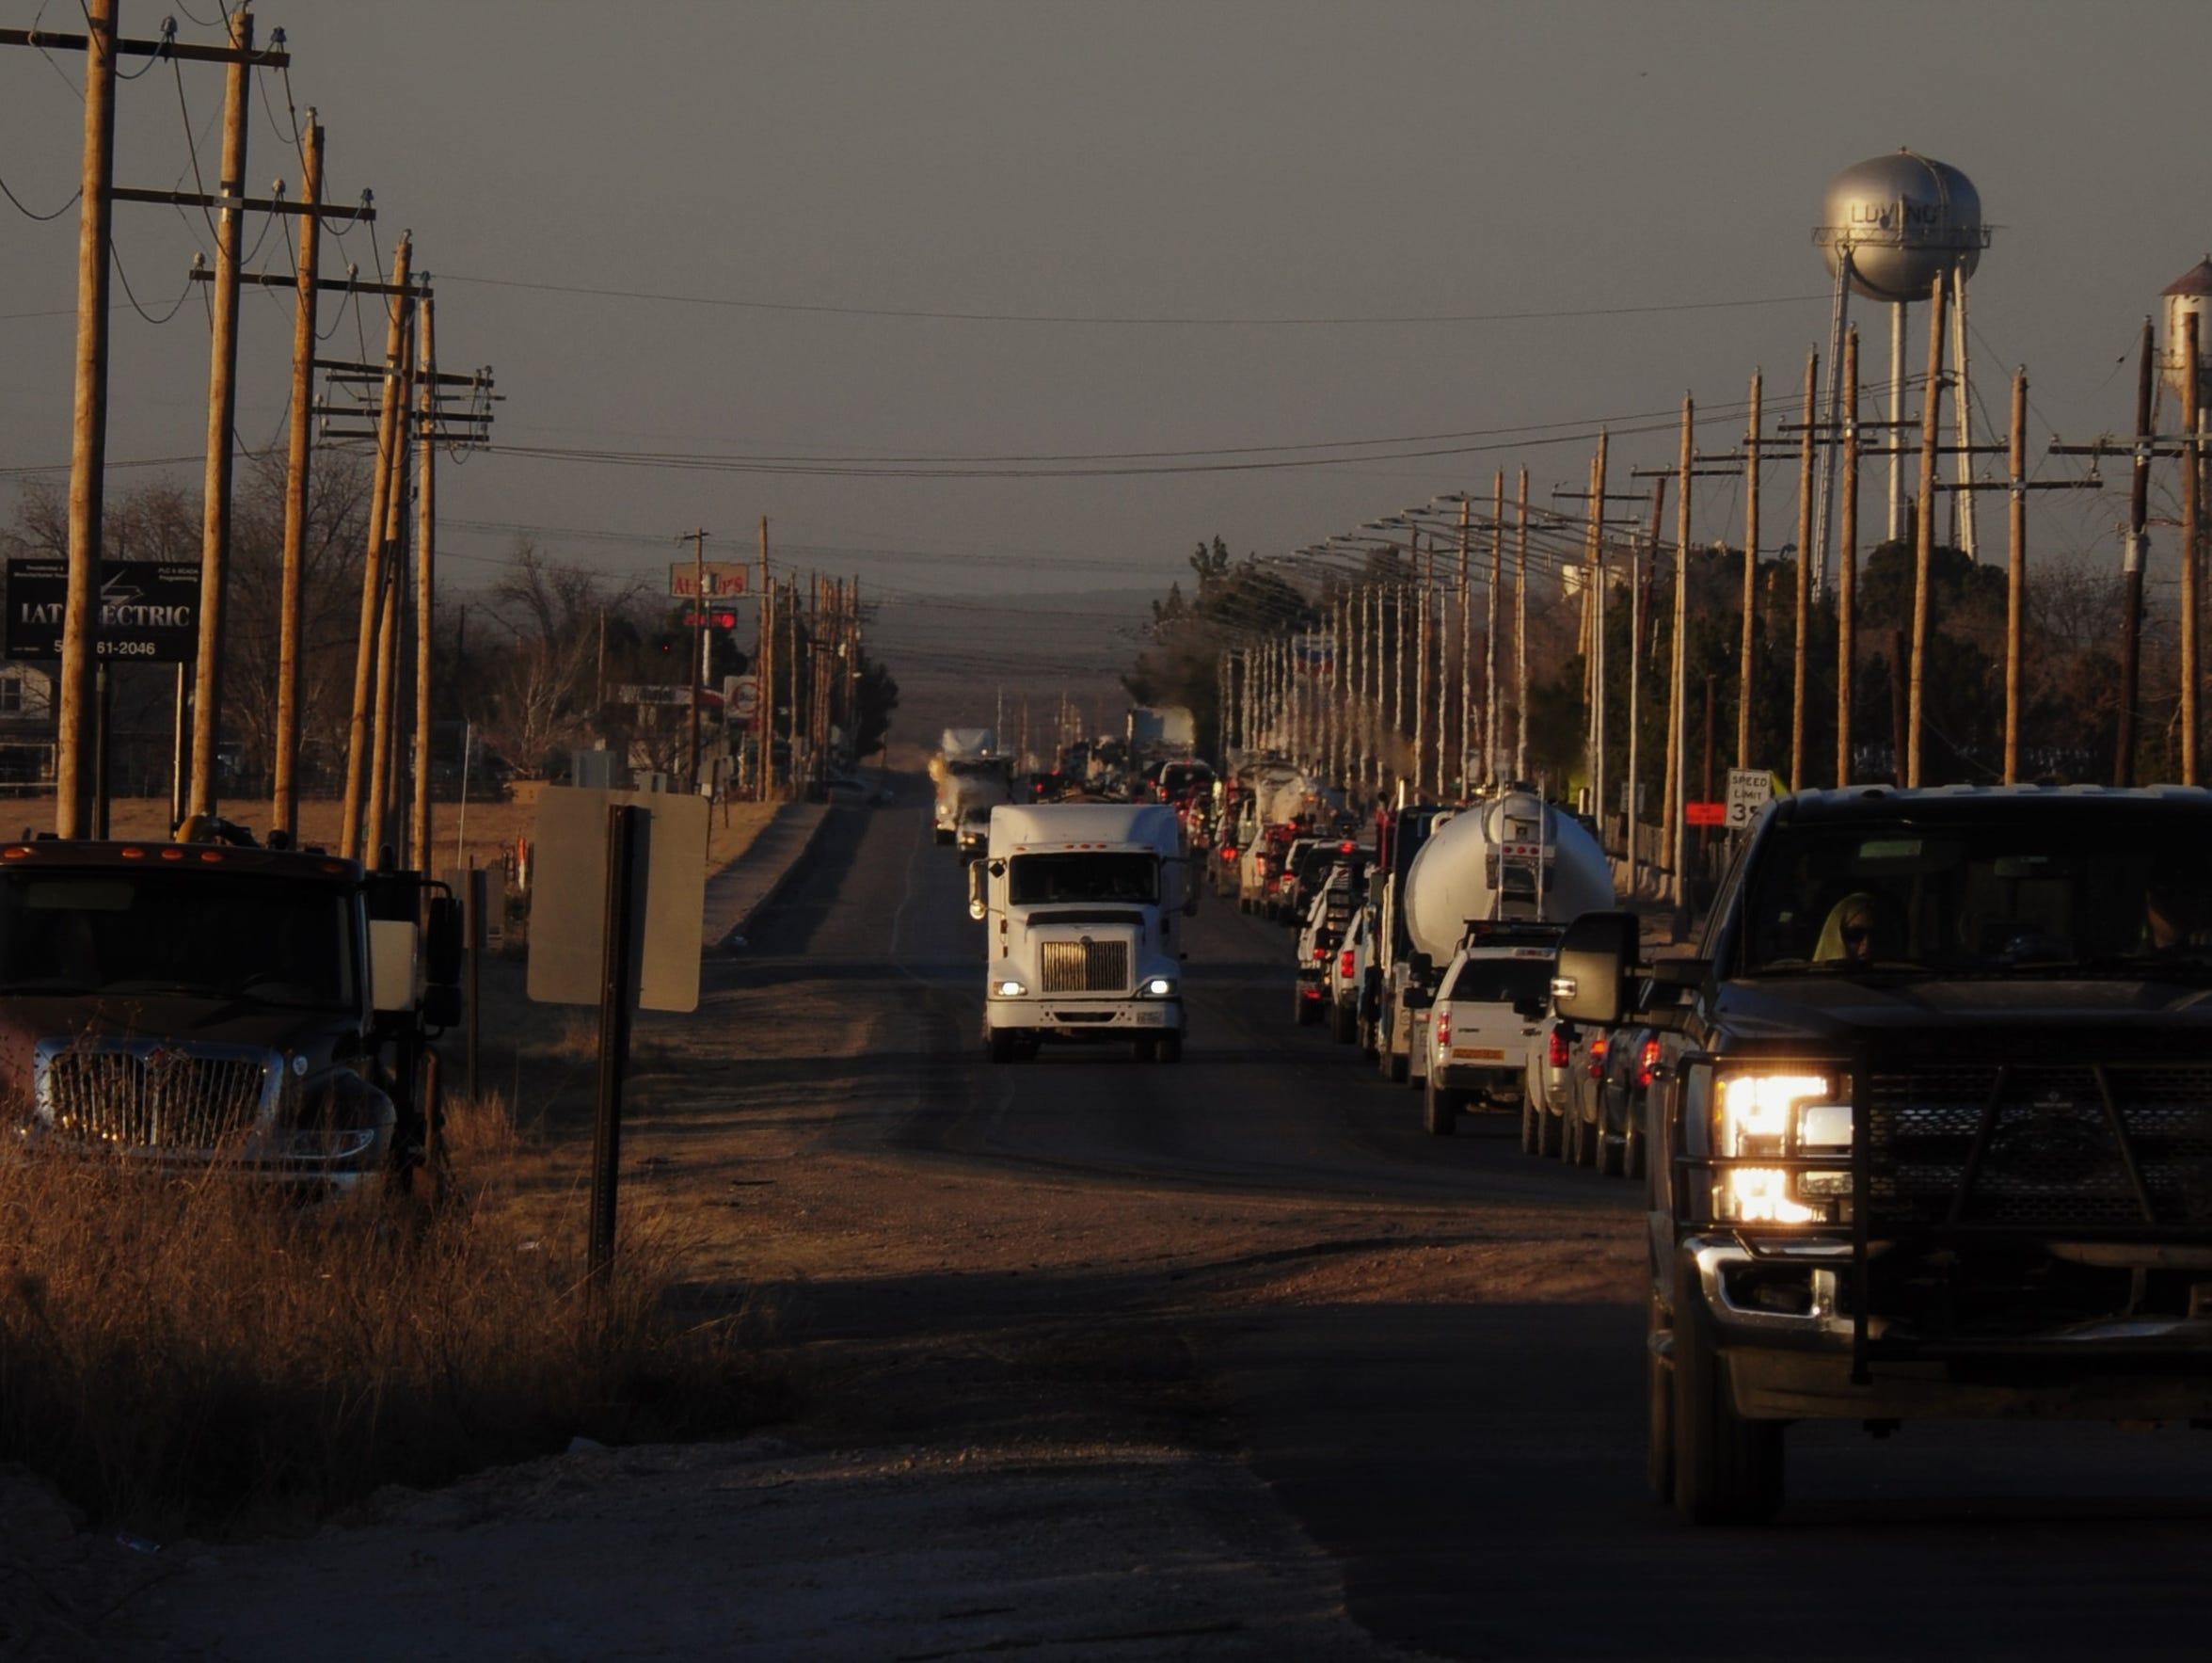 Traffic on U.S. Highway 285 Feb. 8 near Loving, New